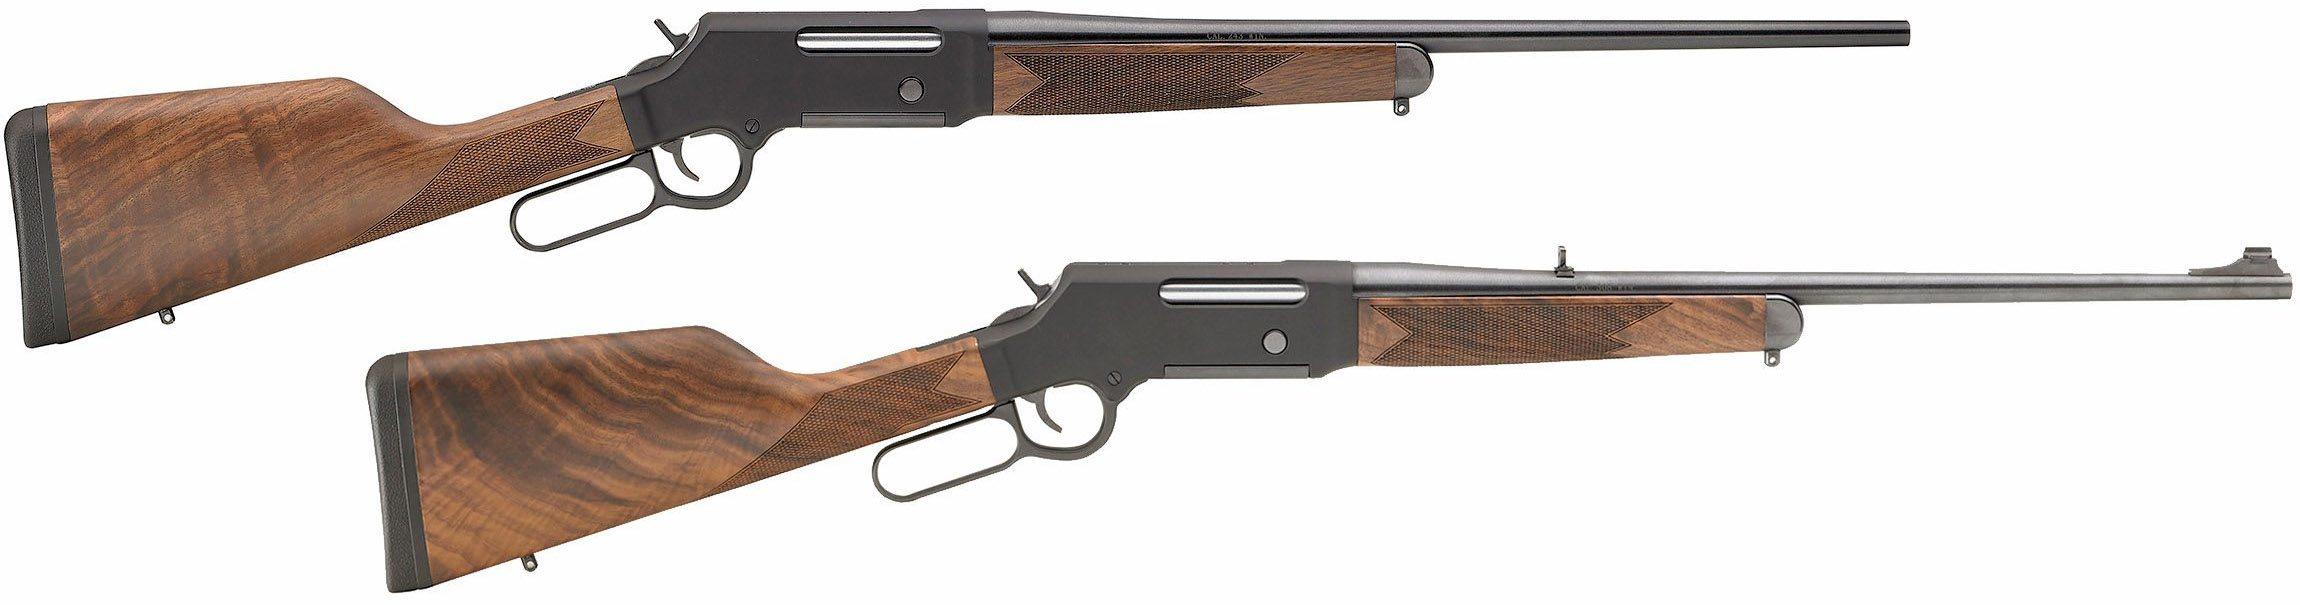 Henry Long Ranger Lever Action Rifle